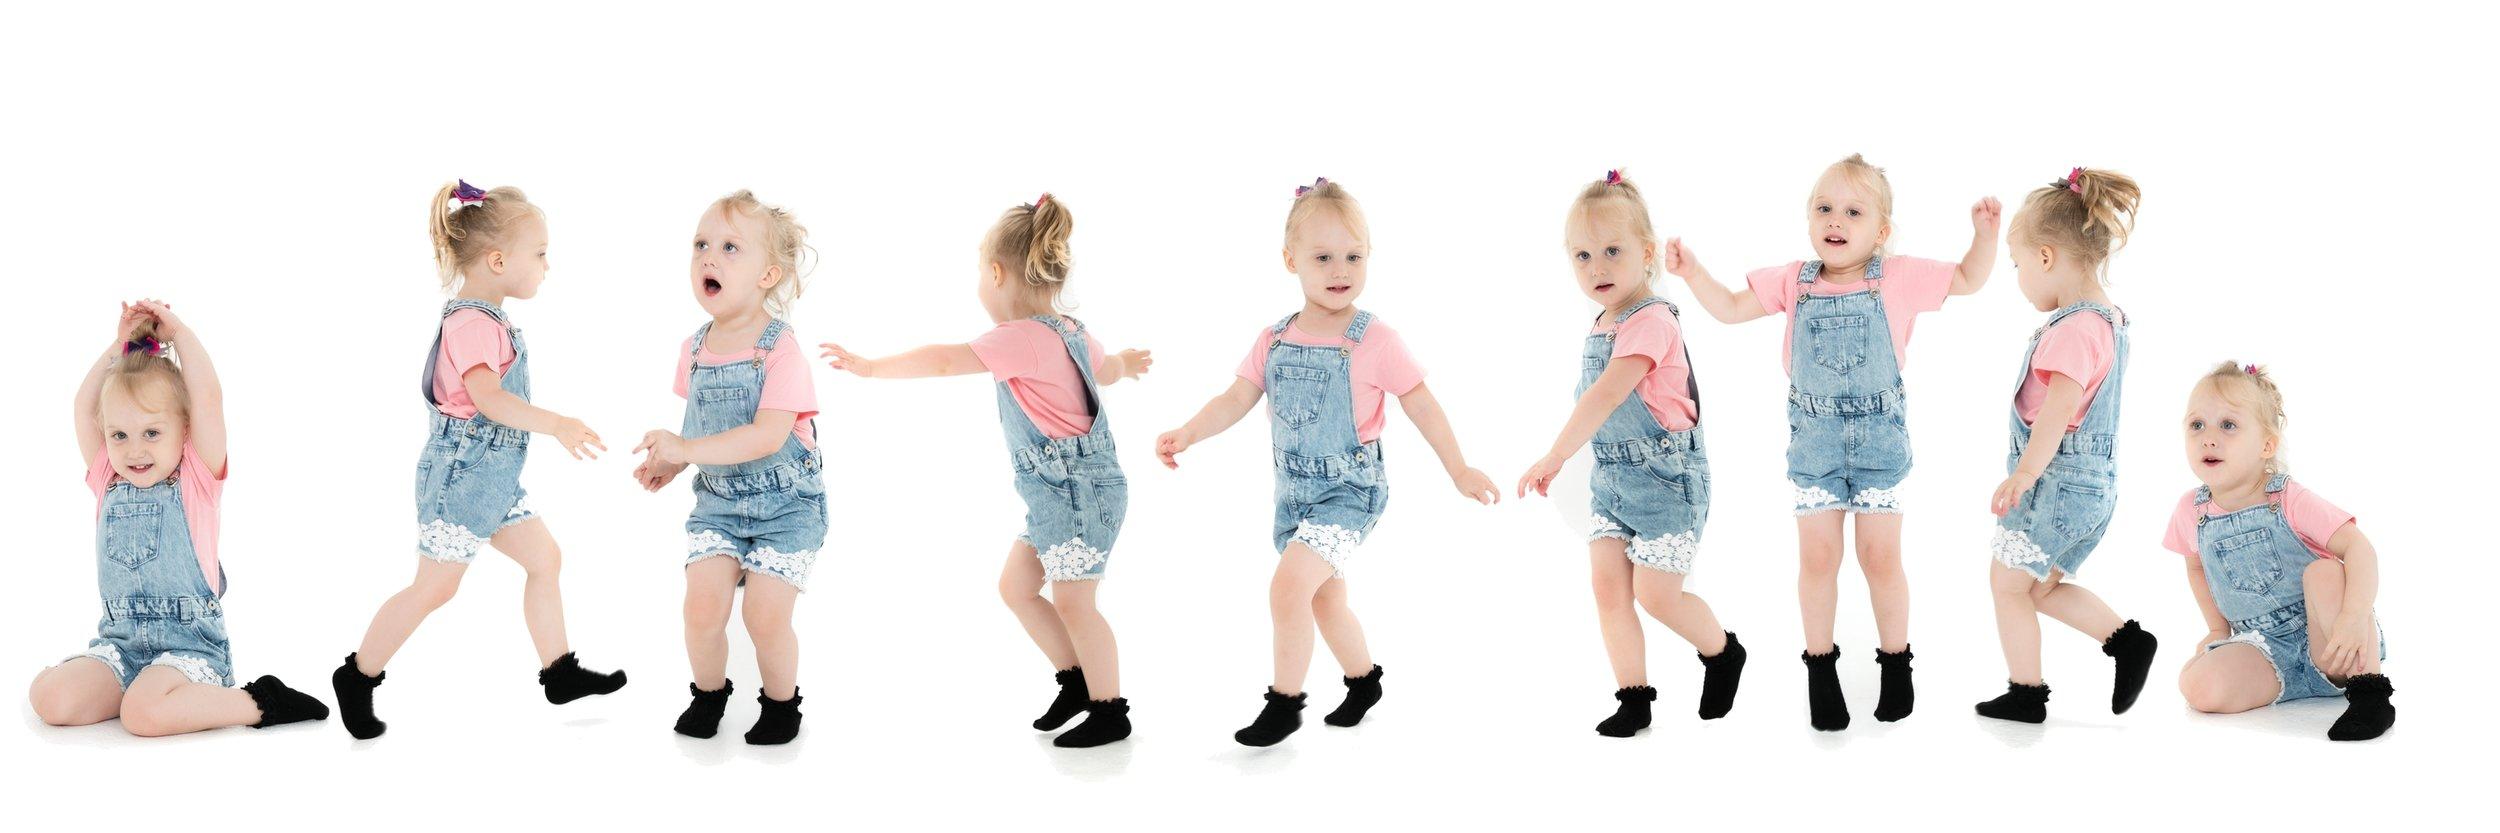 zig-zag-photography-leicester-kids-photoshoot